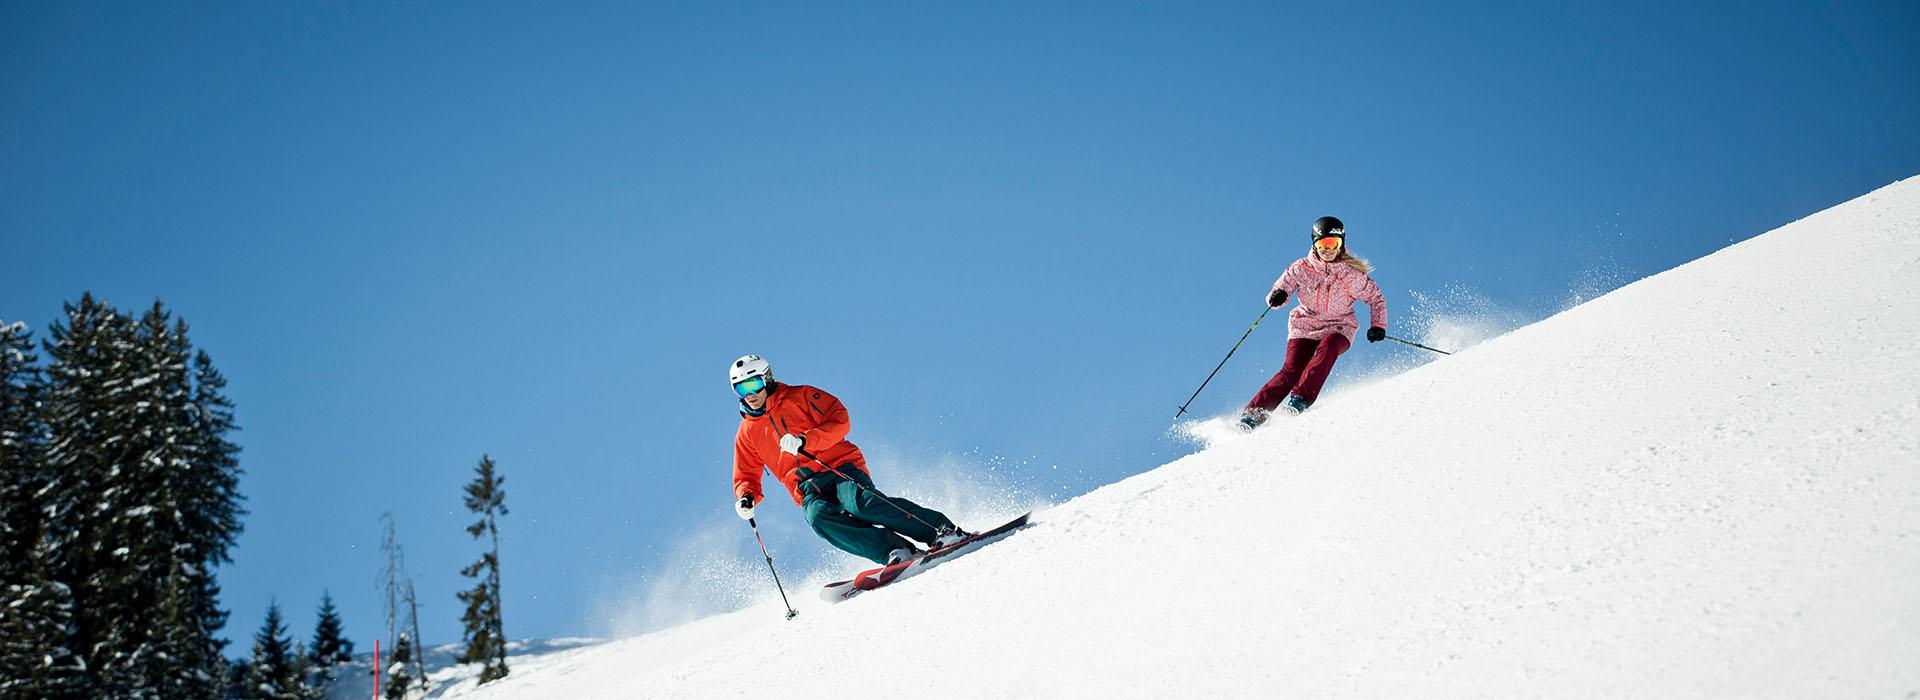 skigebiete im salzburger land zell am see saalbach kitzsteinhorn. Black Bedroom Furniture Sets. Home Design Ideas